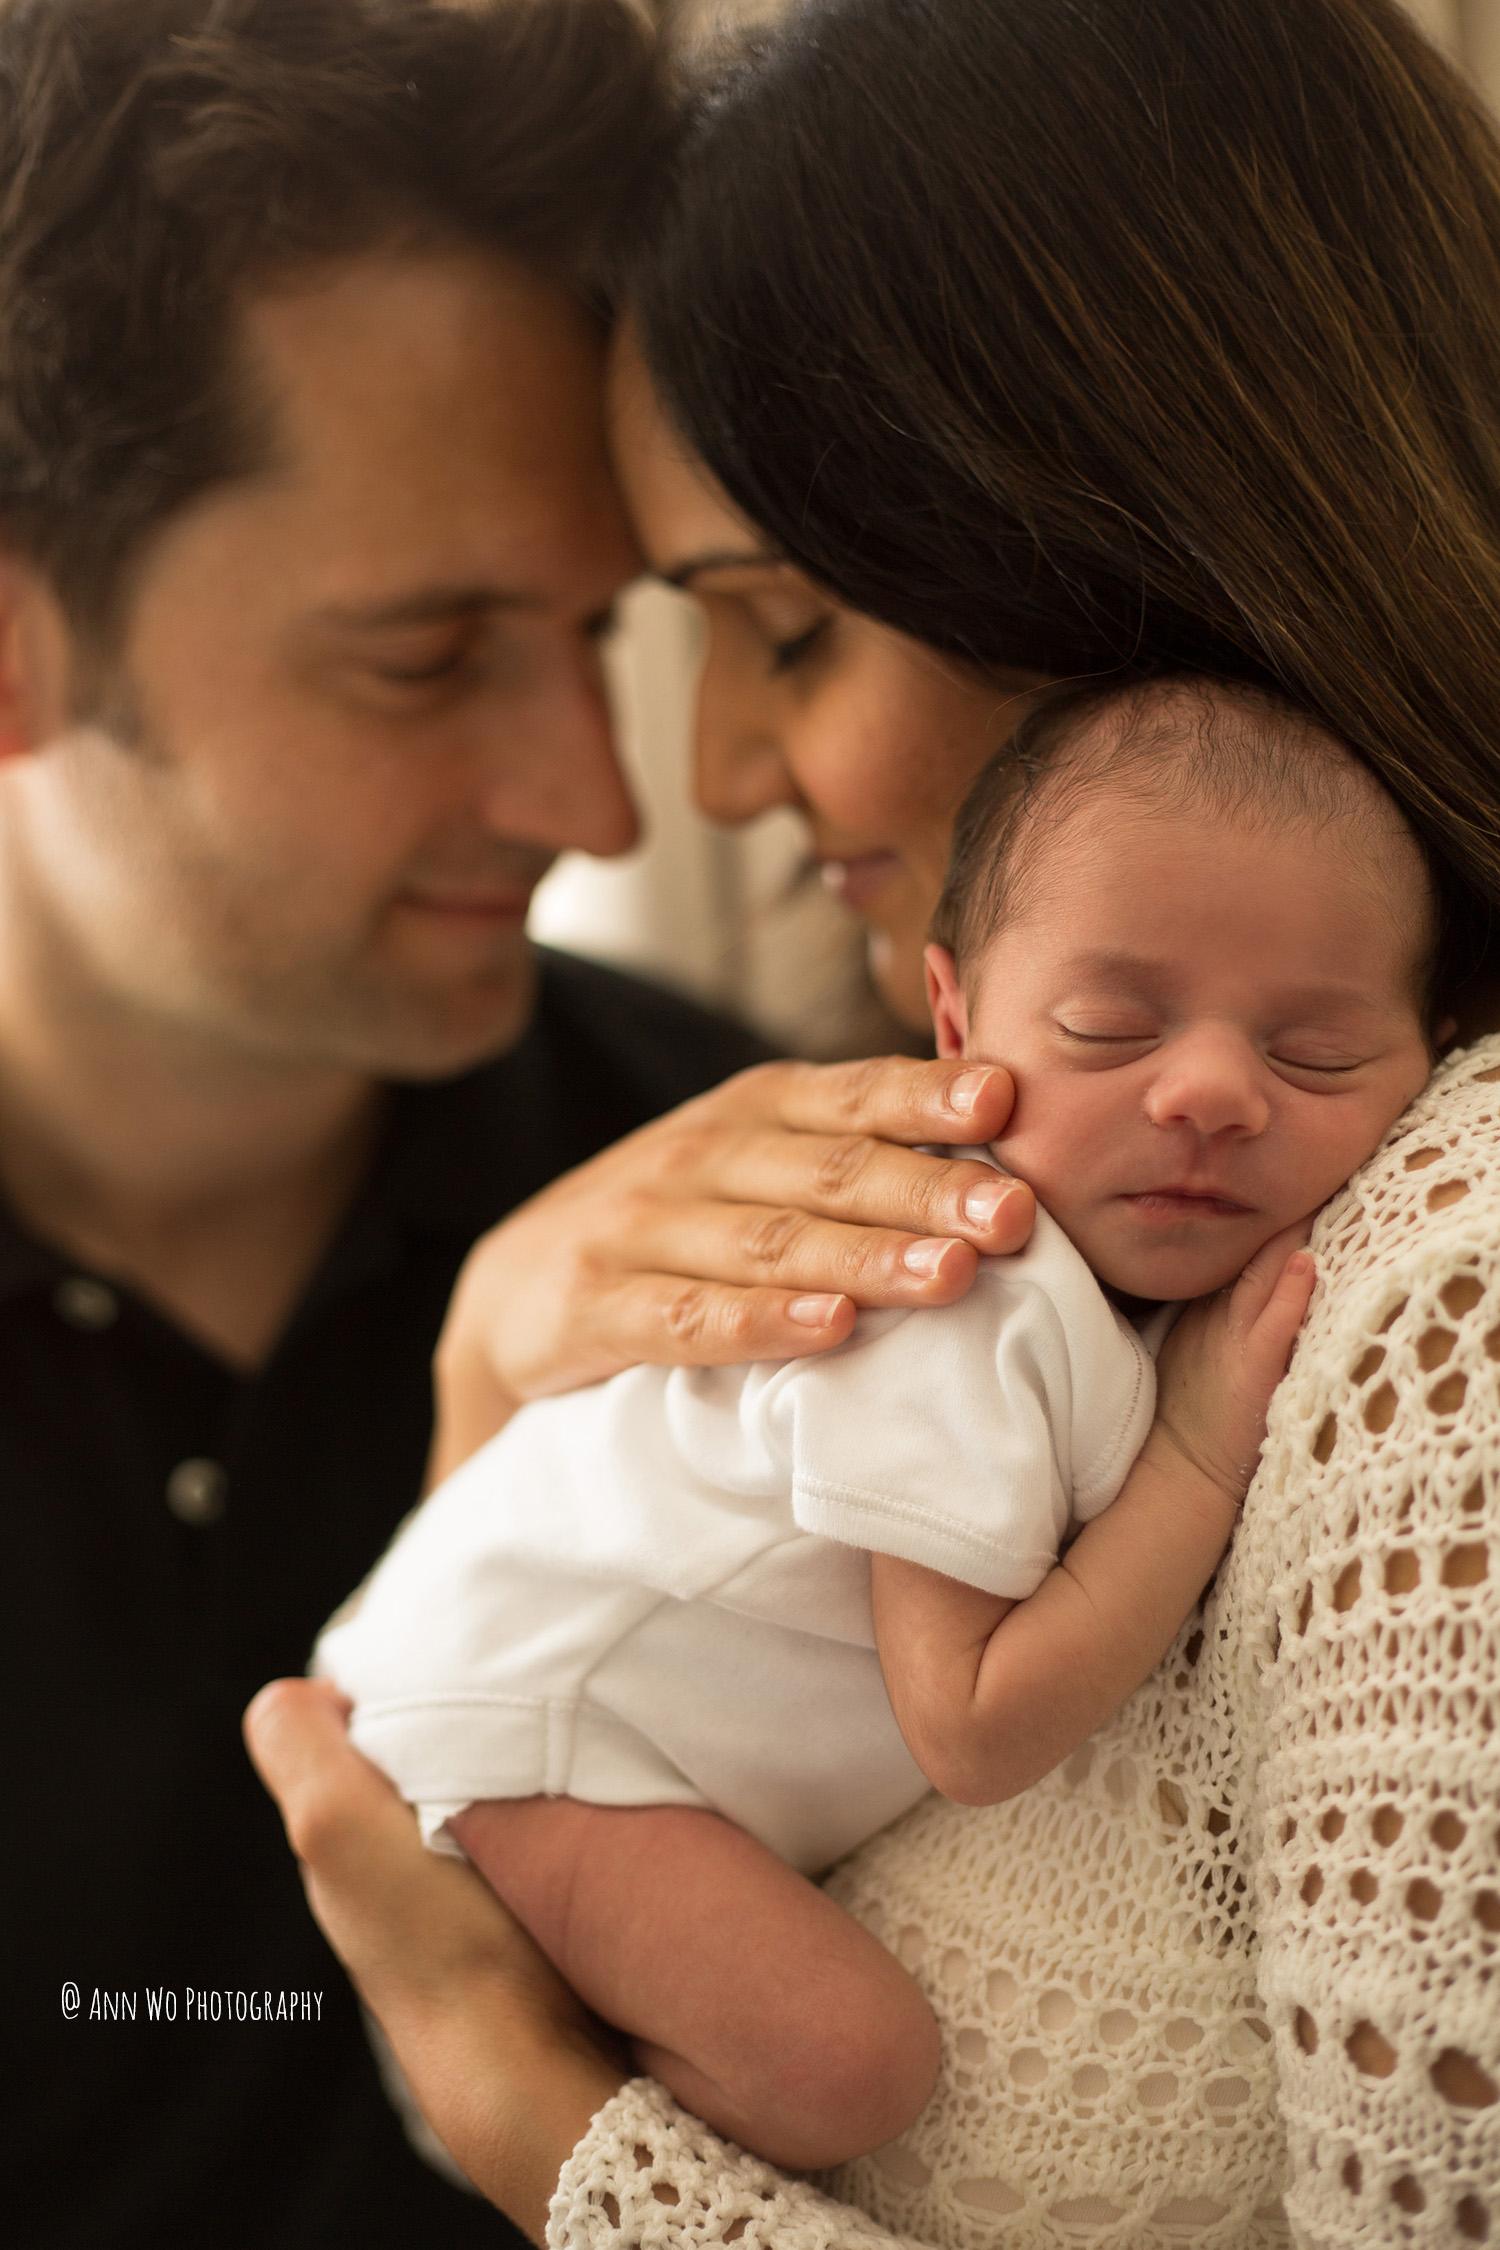 newborn-photographer-london-maternity-photography-uk-ann-wo037.jpg